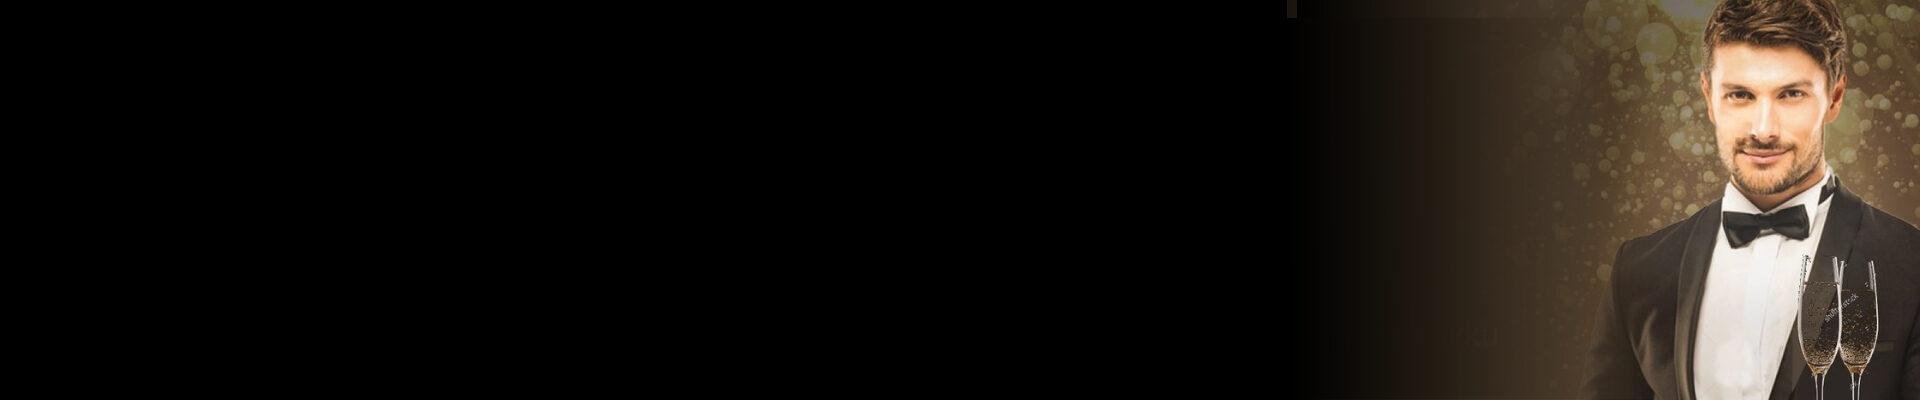 banner vanocni vecirek 2021